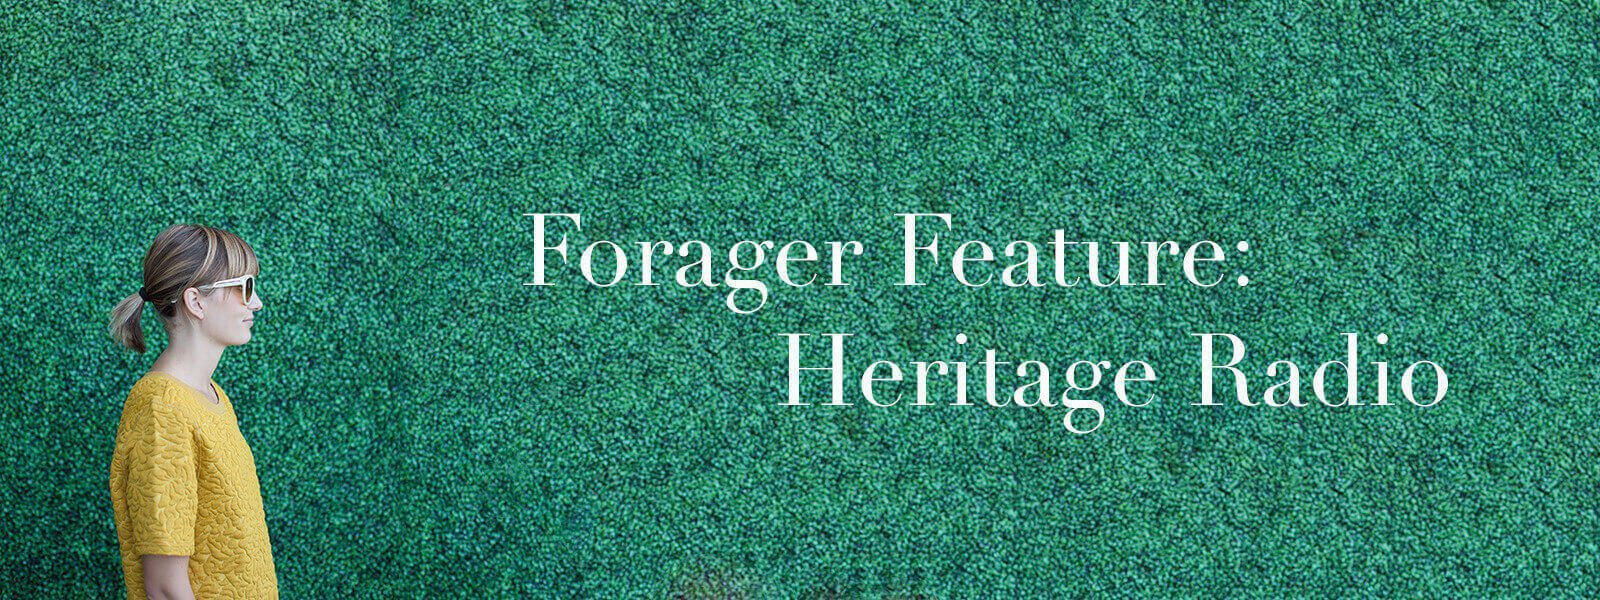 Heritage-Radio-Banner